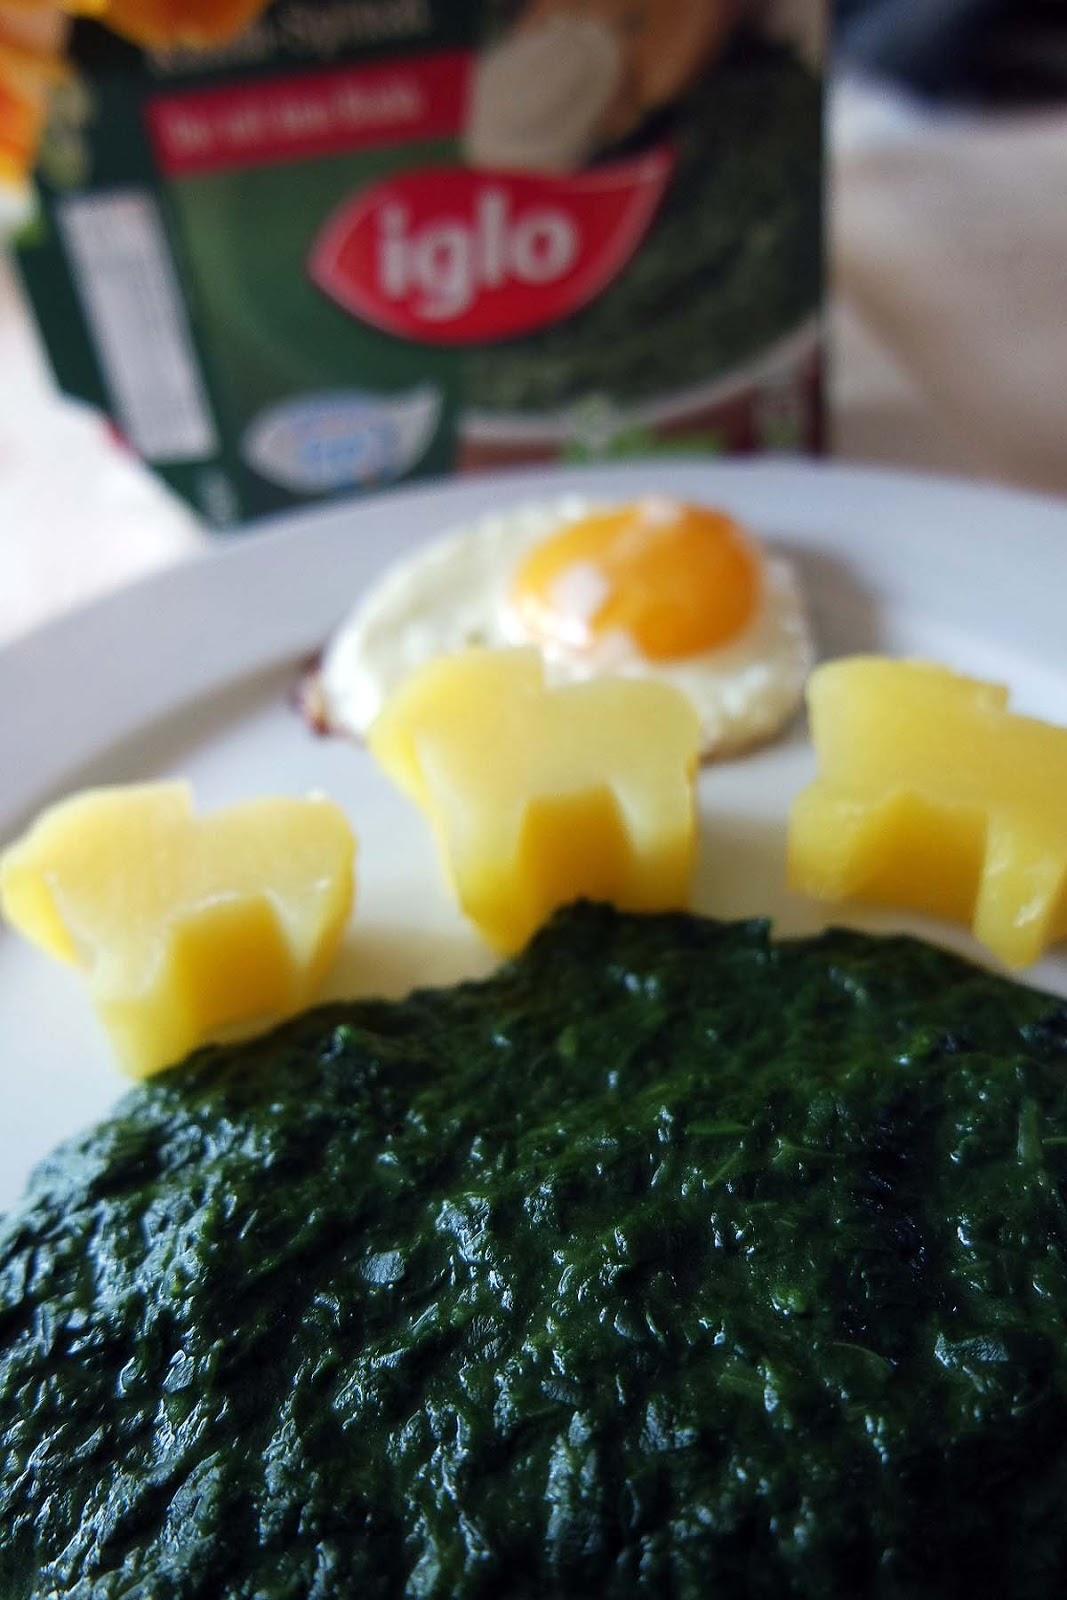 lacto vegetarisches aus dem hause iglo und essen eure kinder gerne spinat filine bloggt. Black Bedroom Furniture Sets. Home Design Ideas